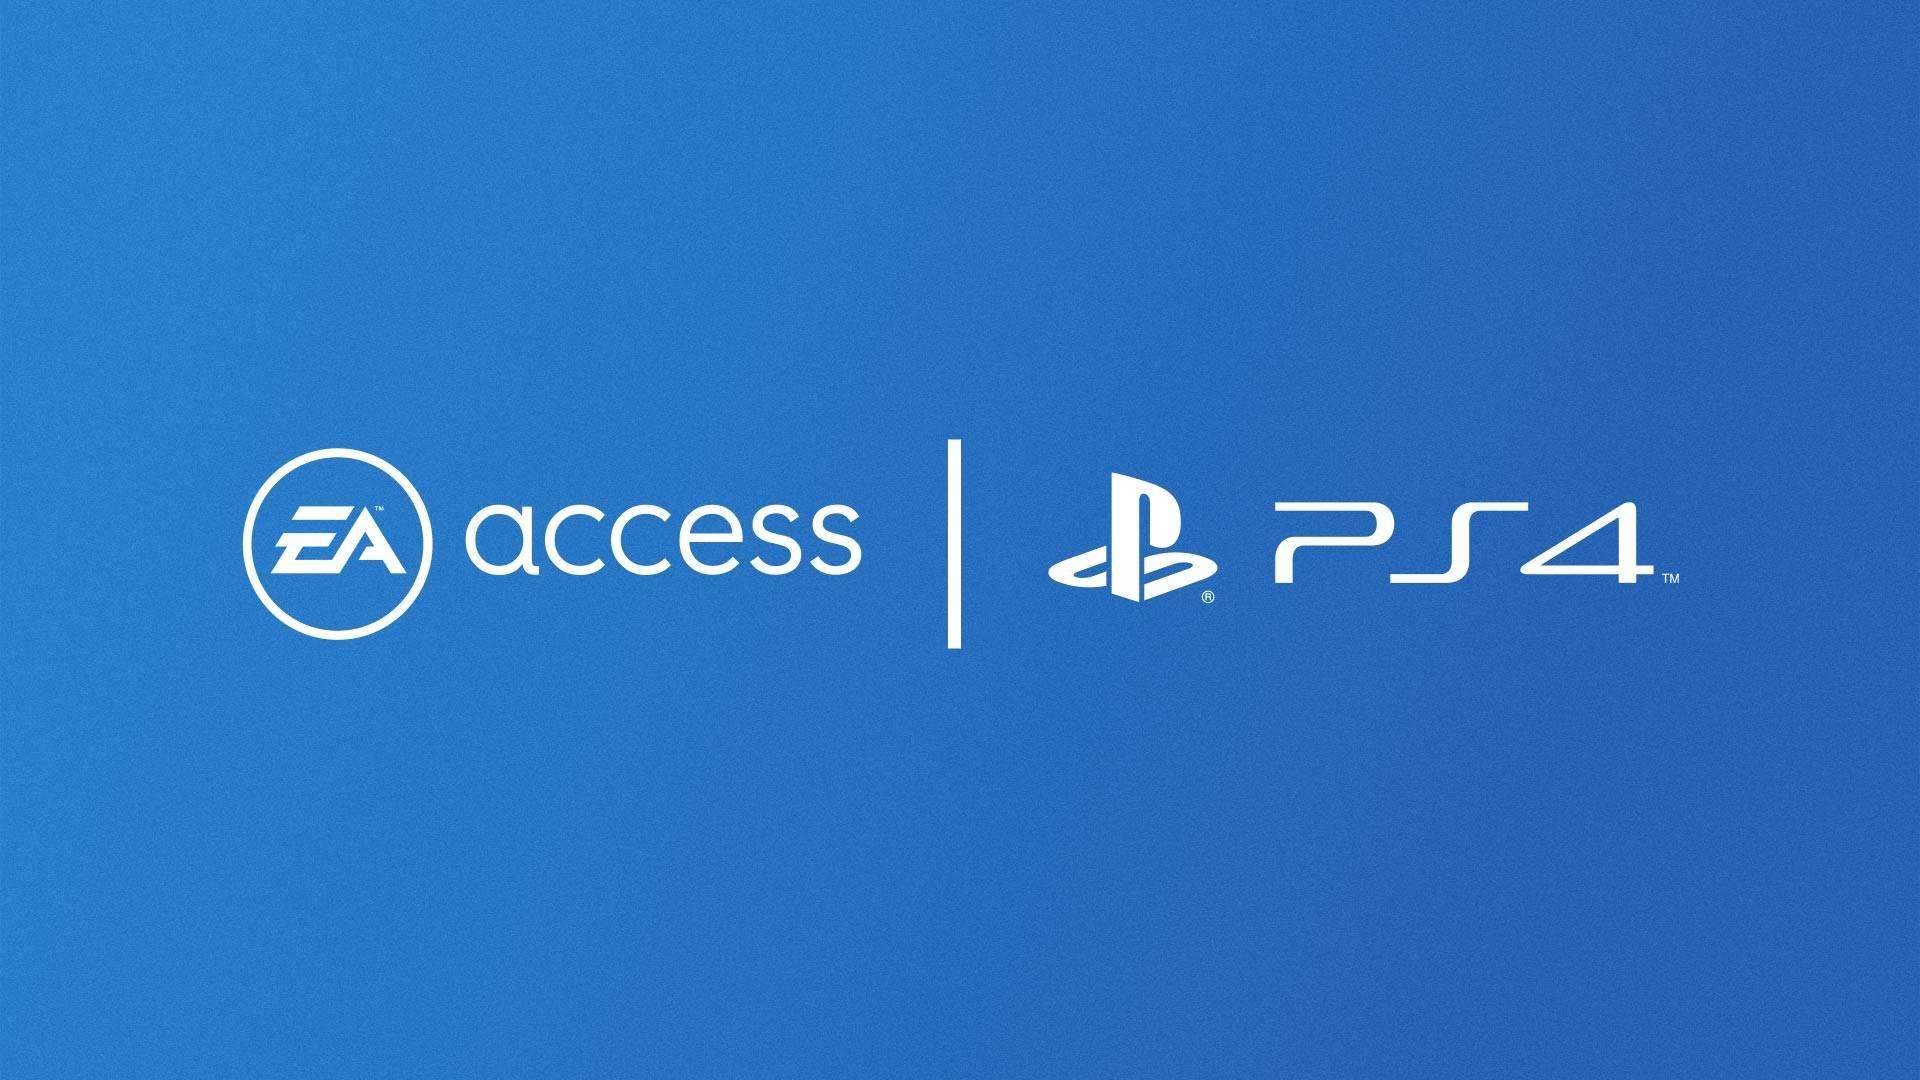 Electronic Arts acredita que o streaming vai atrair mais jogadores